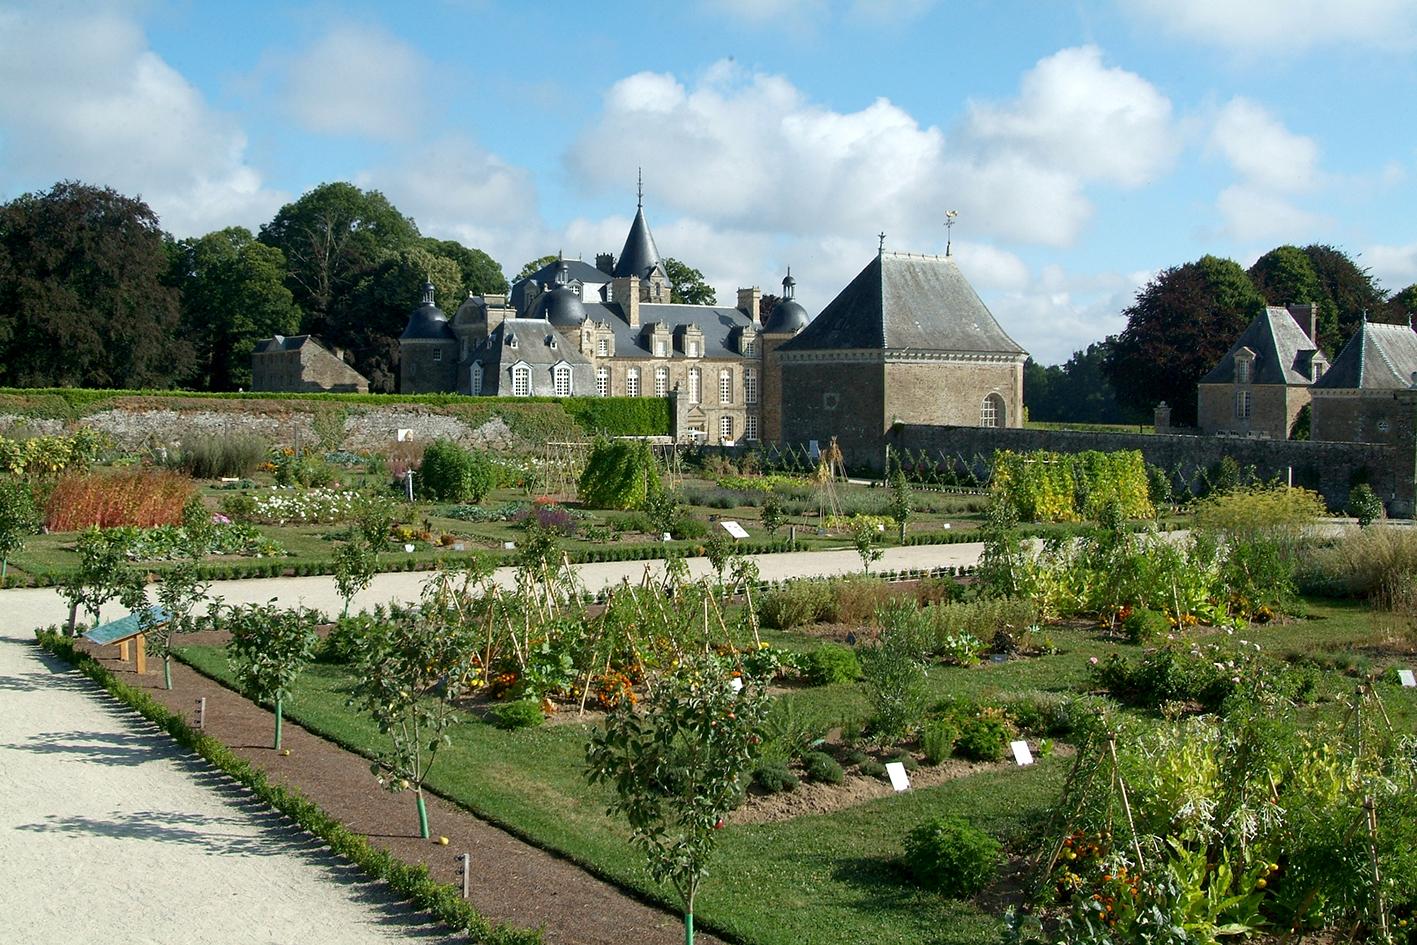 La Bourbansais Jardin Potager 9407.JPG